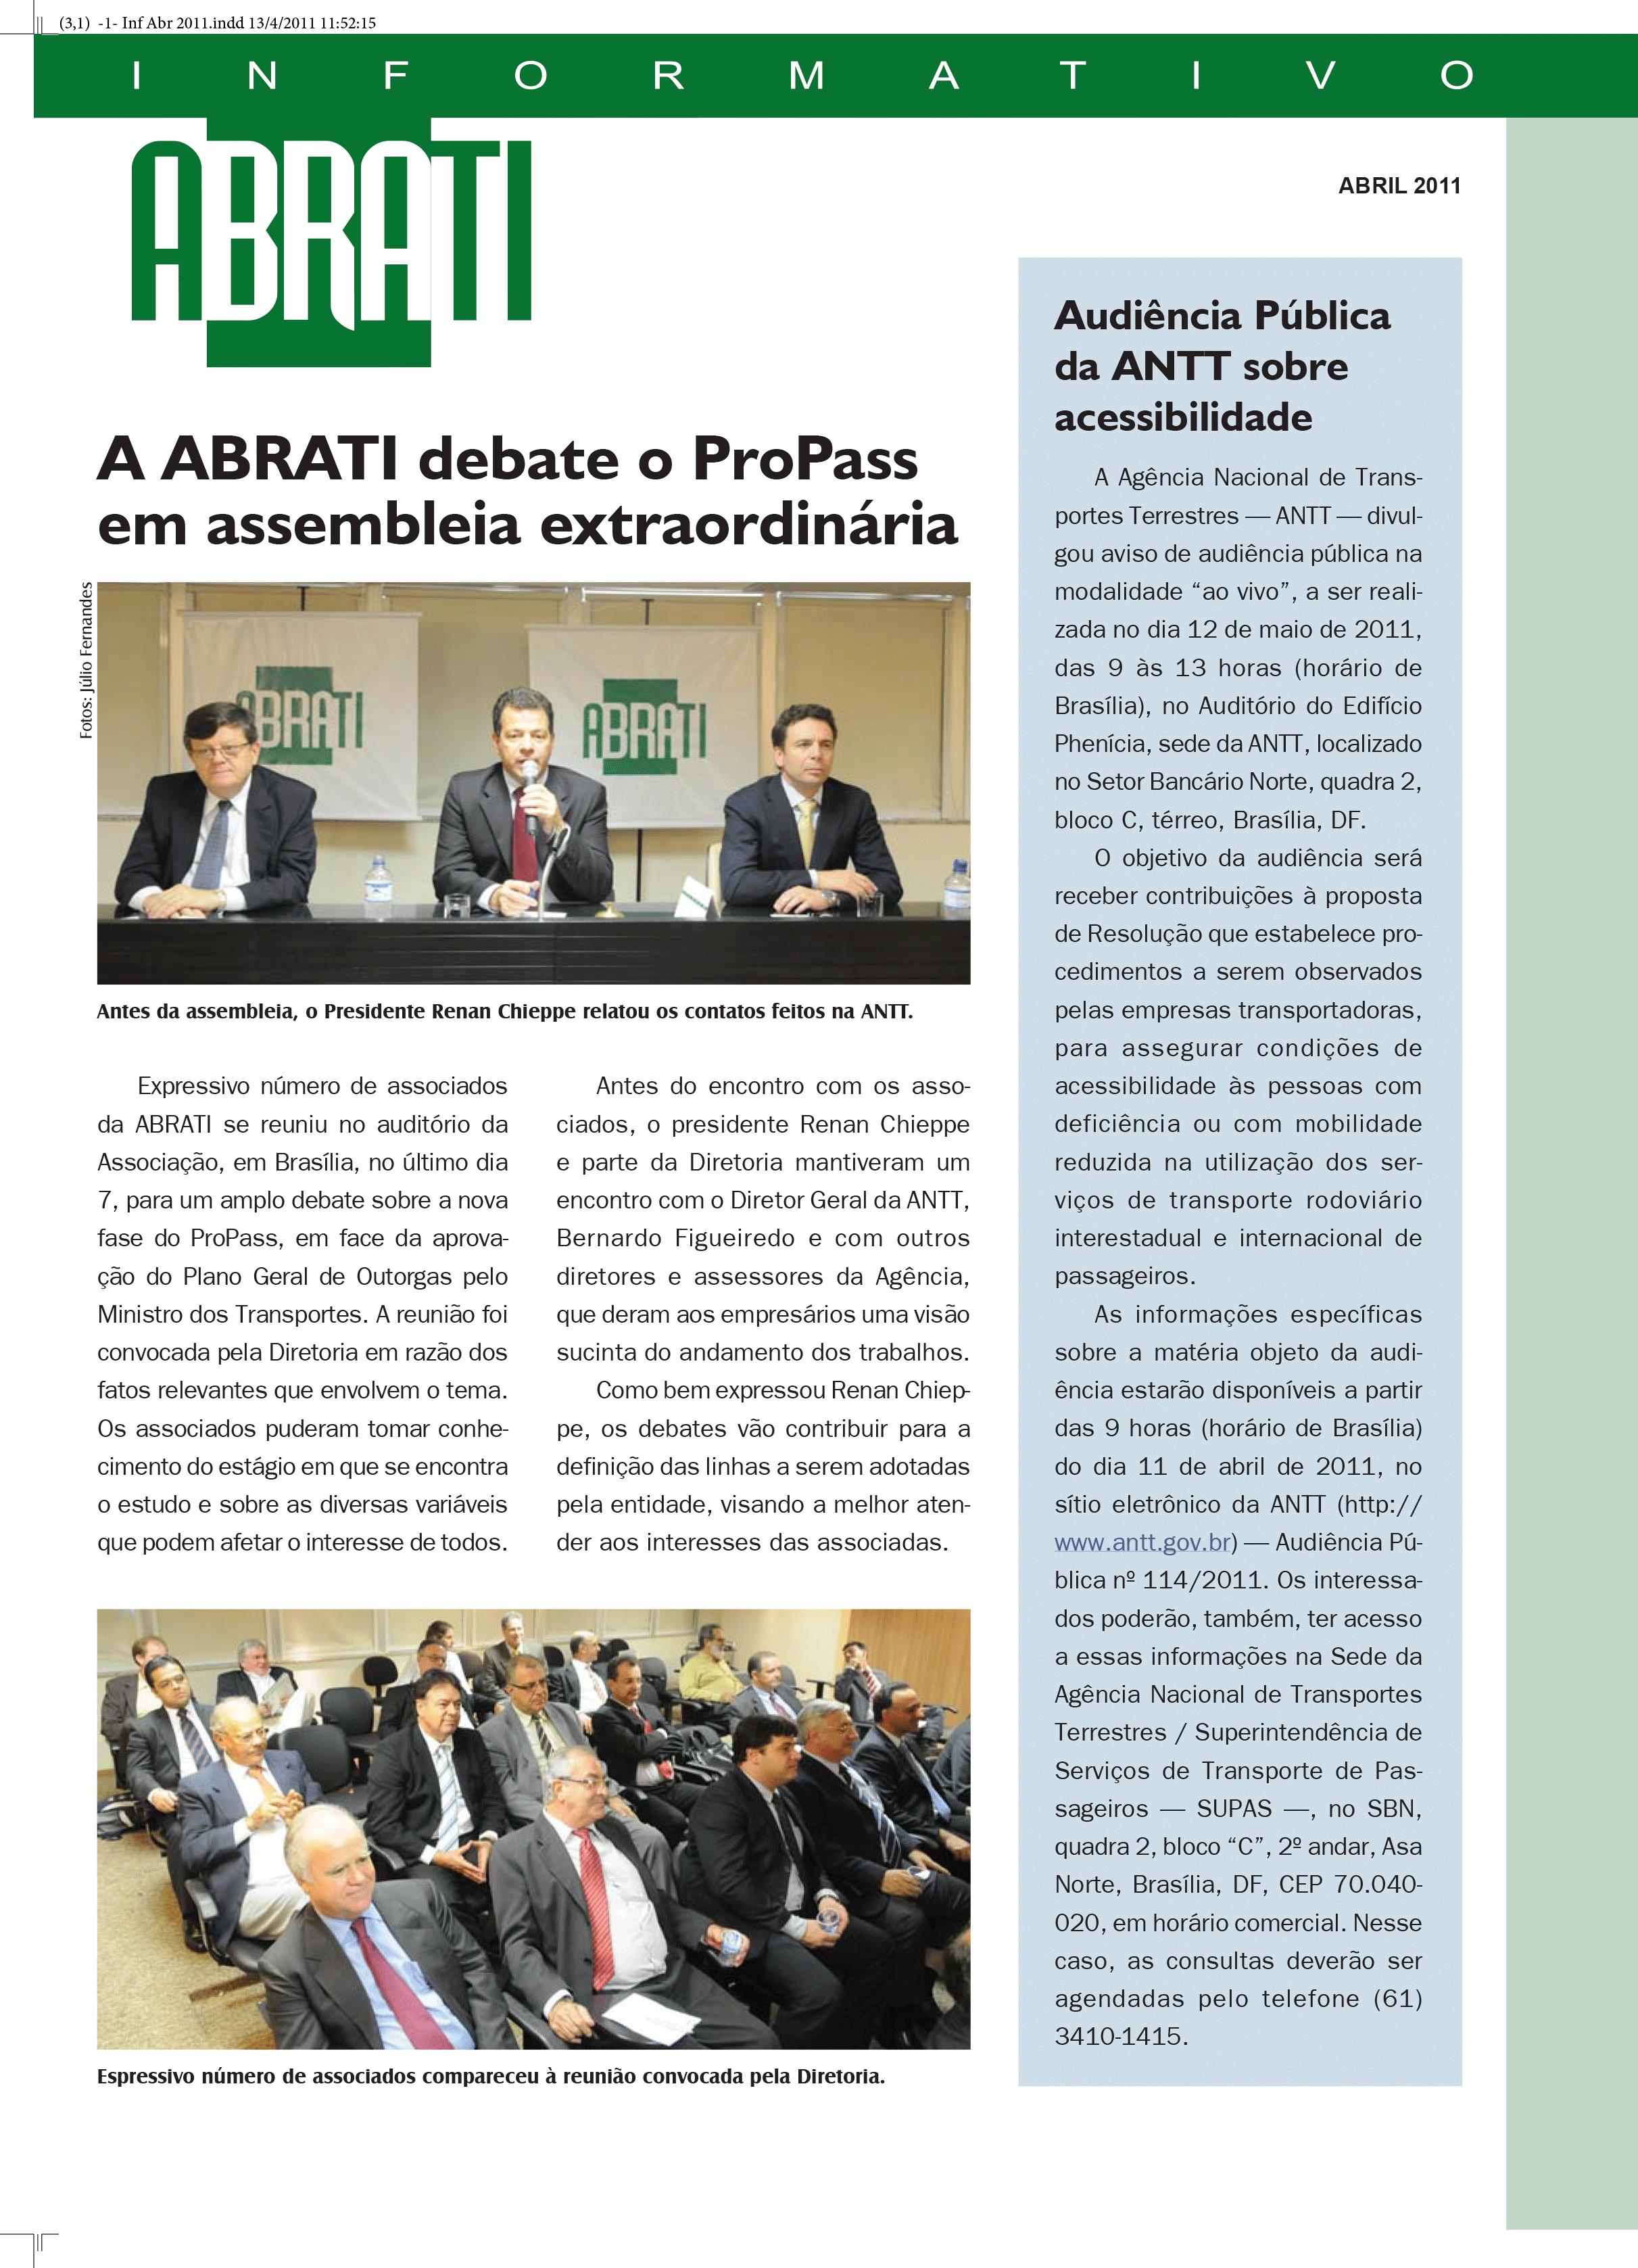 Informativo Abril 2011